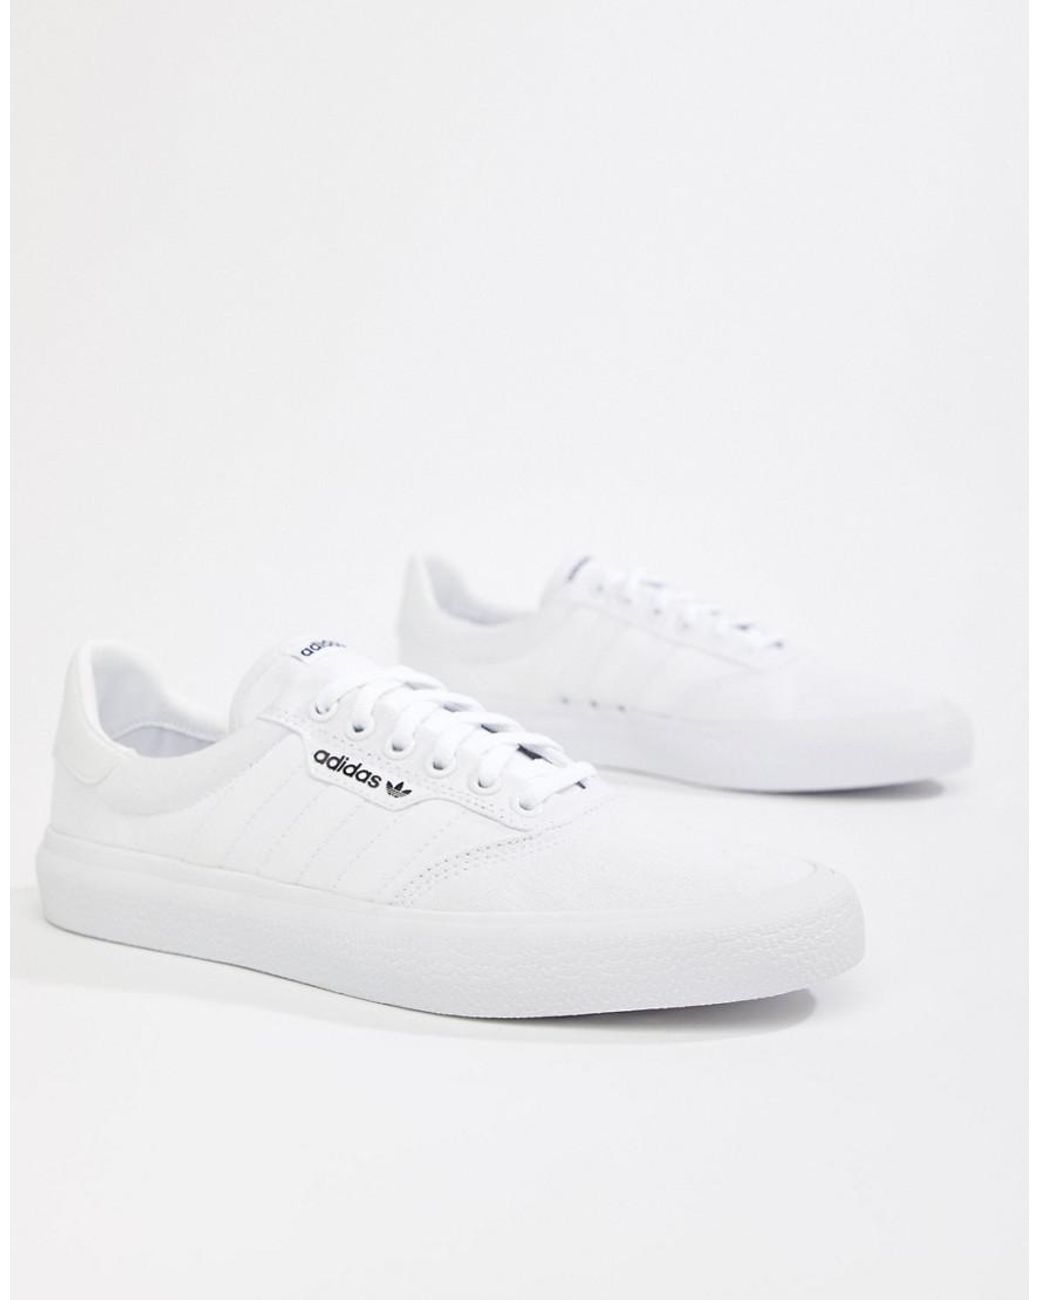 8fee1a52e06b6 adidas Originals Adidas Originals 3mc Trainers In White B22705 in White for  Men - Lyst